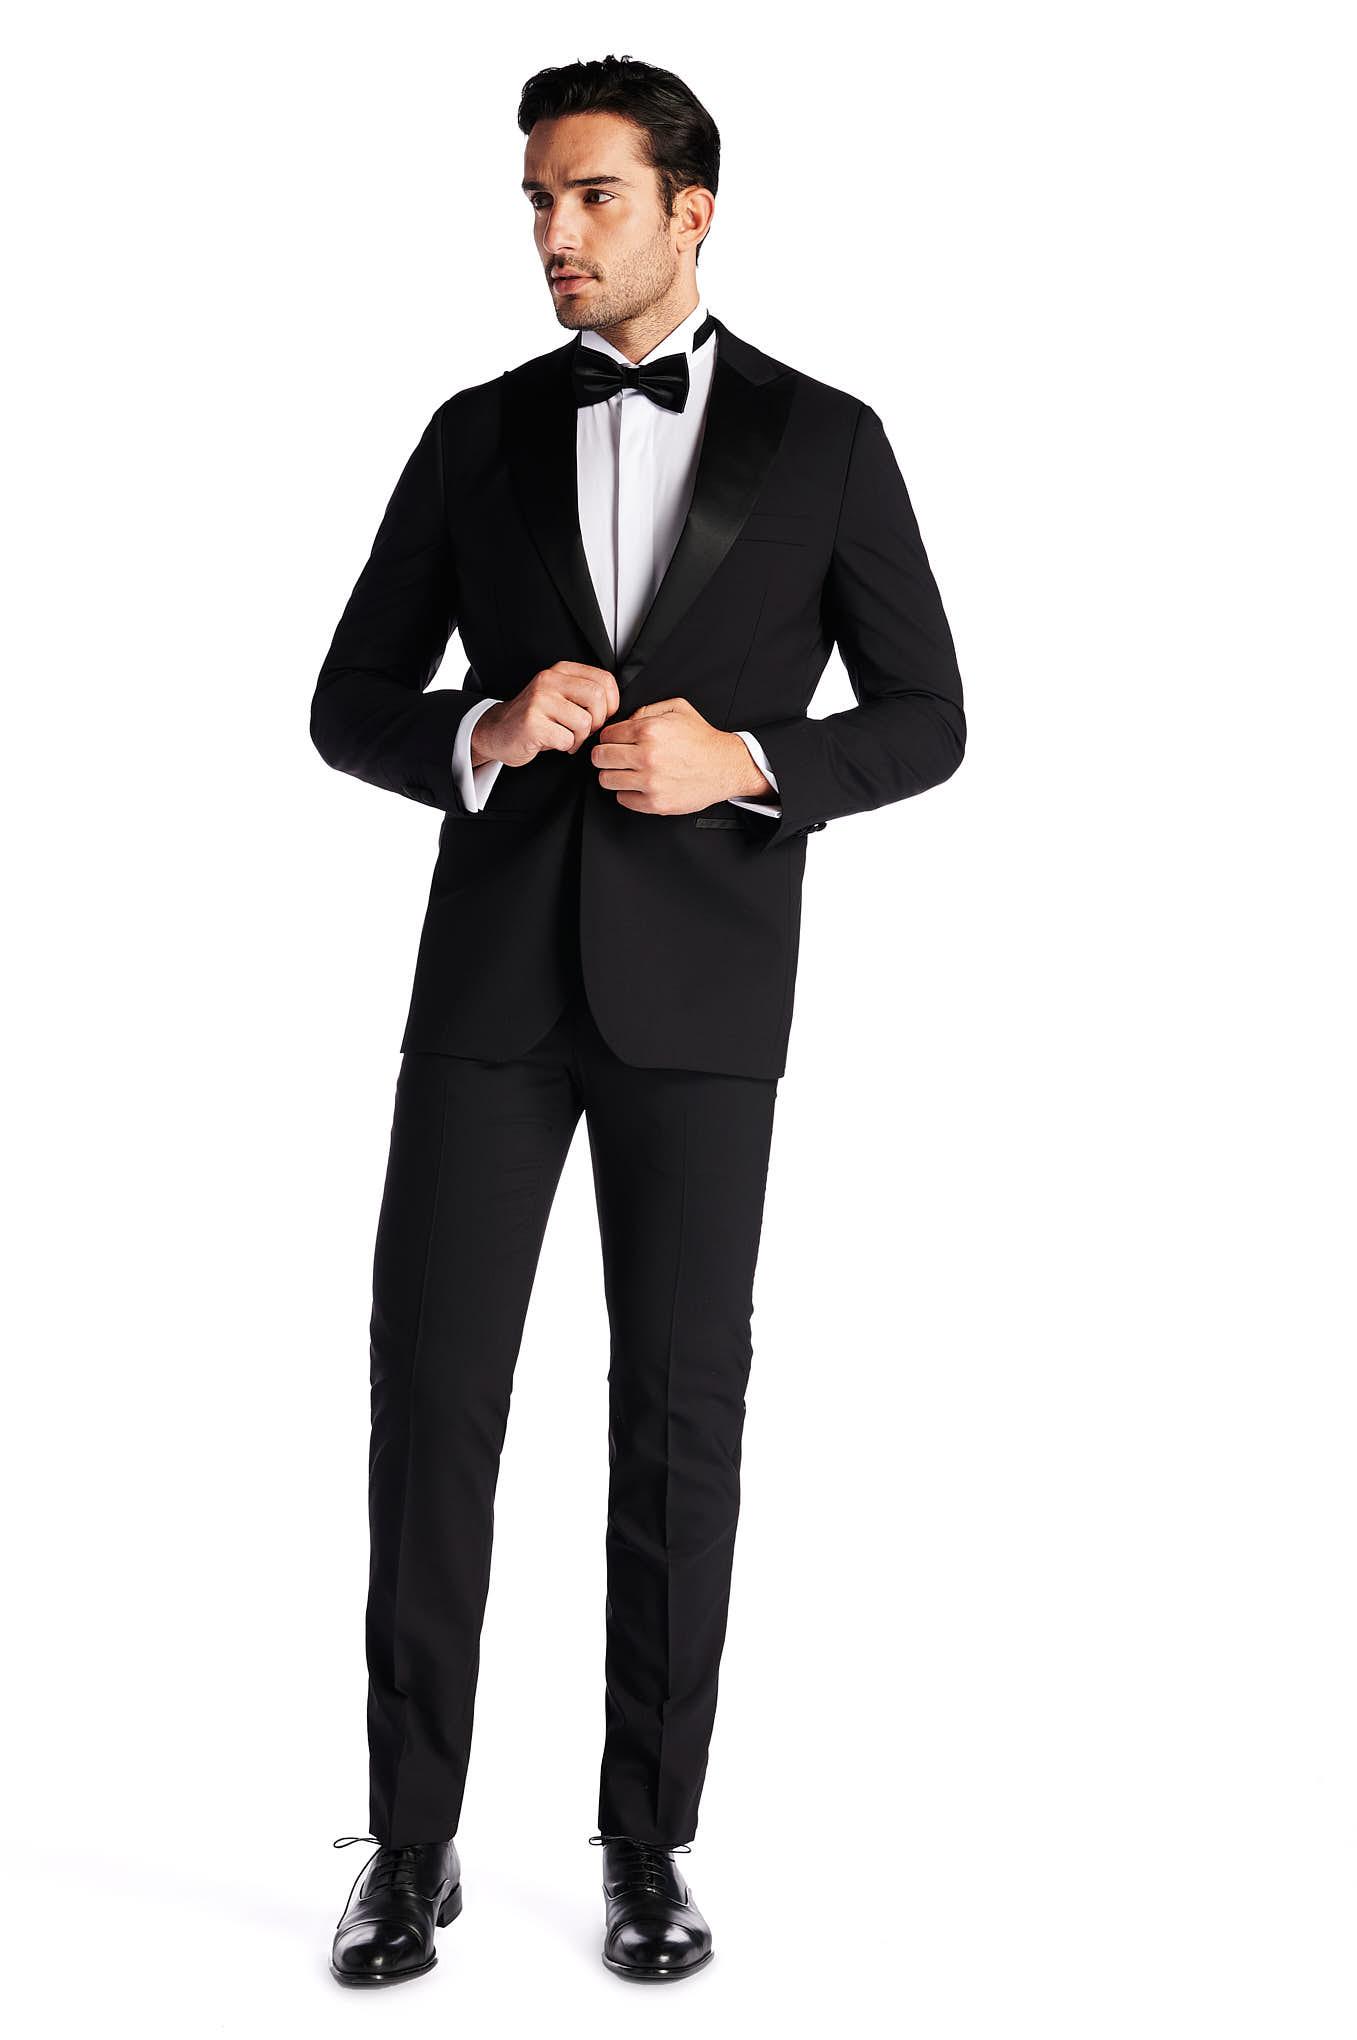 Tuxedo Black Classic Man